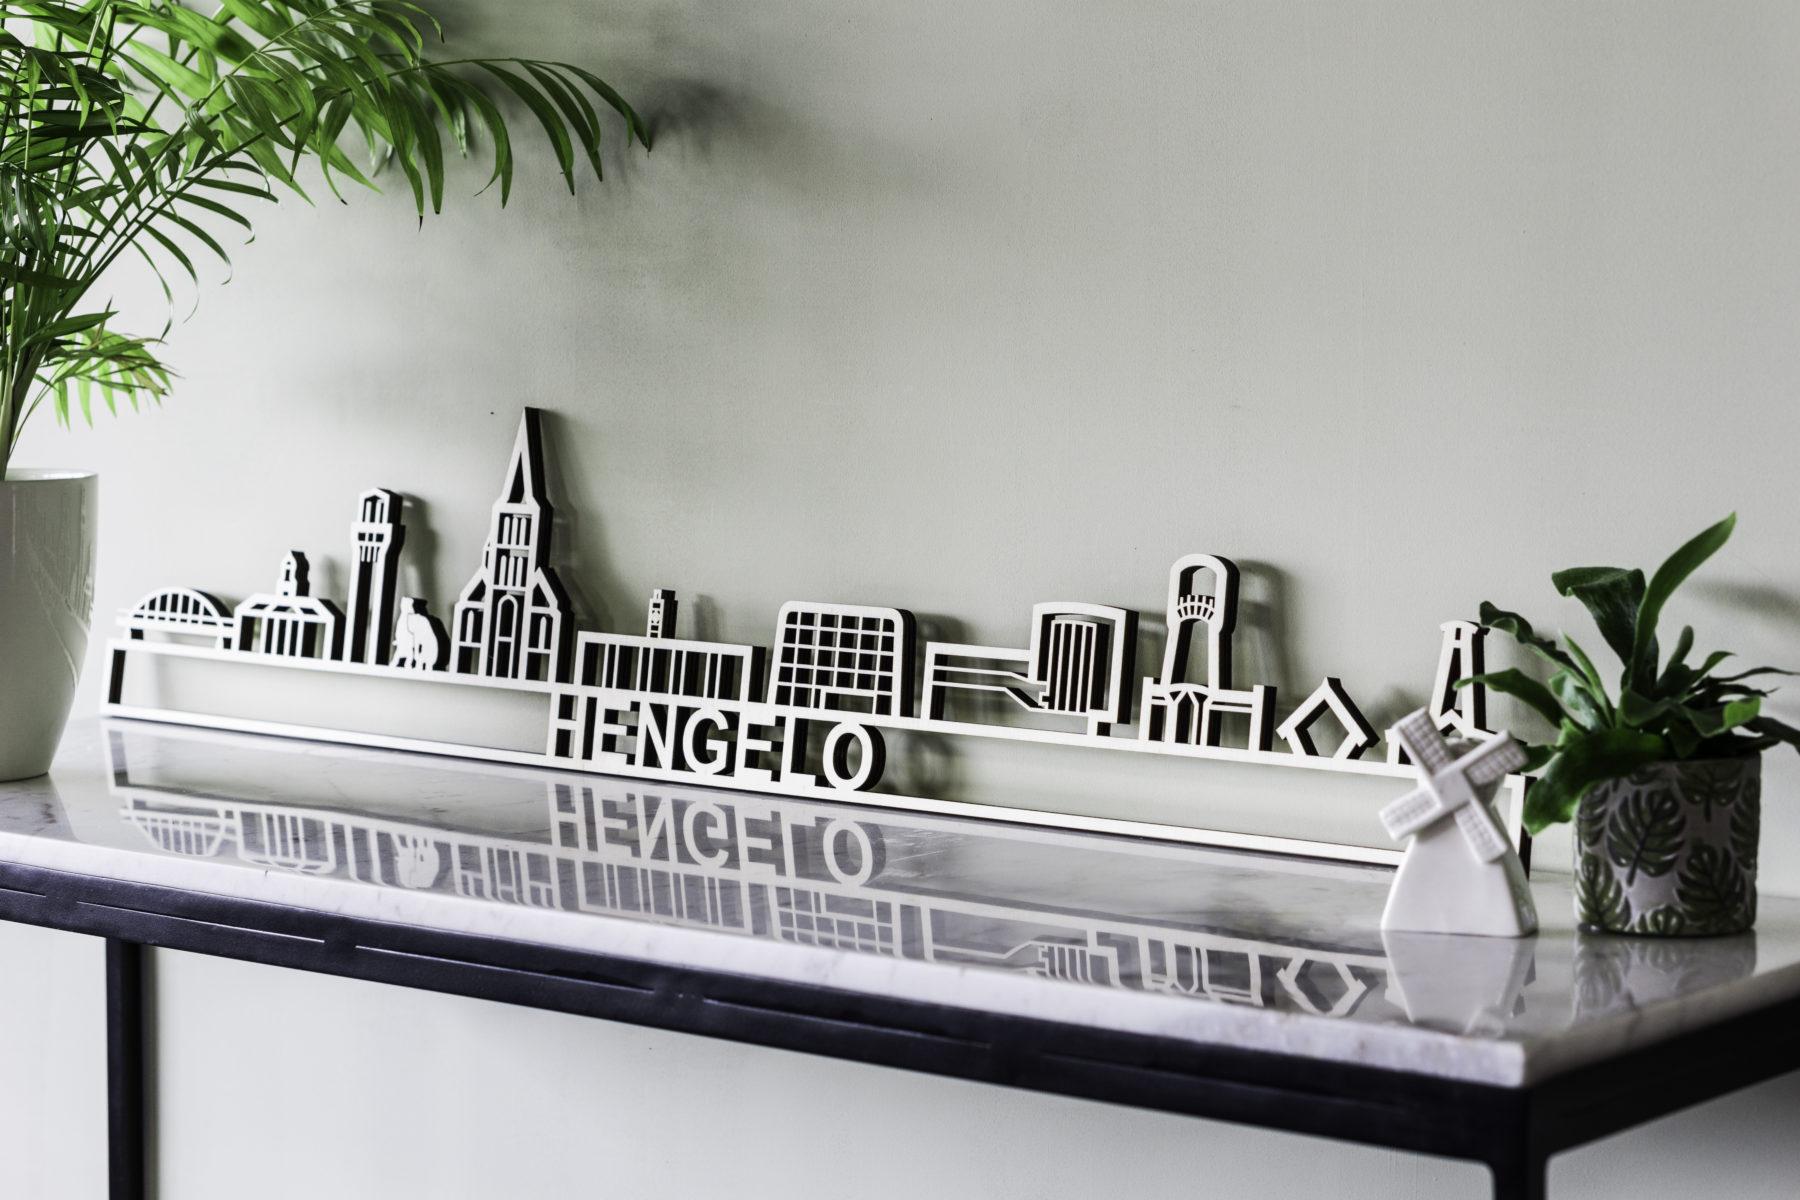 Skyline Hengelo hout